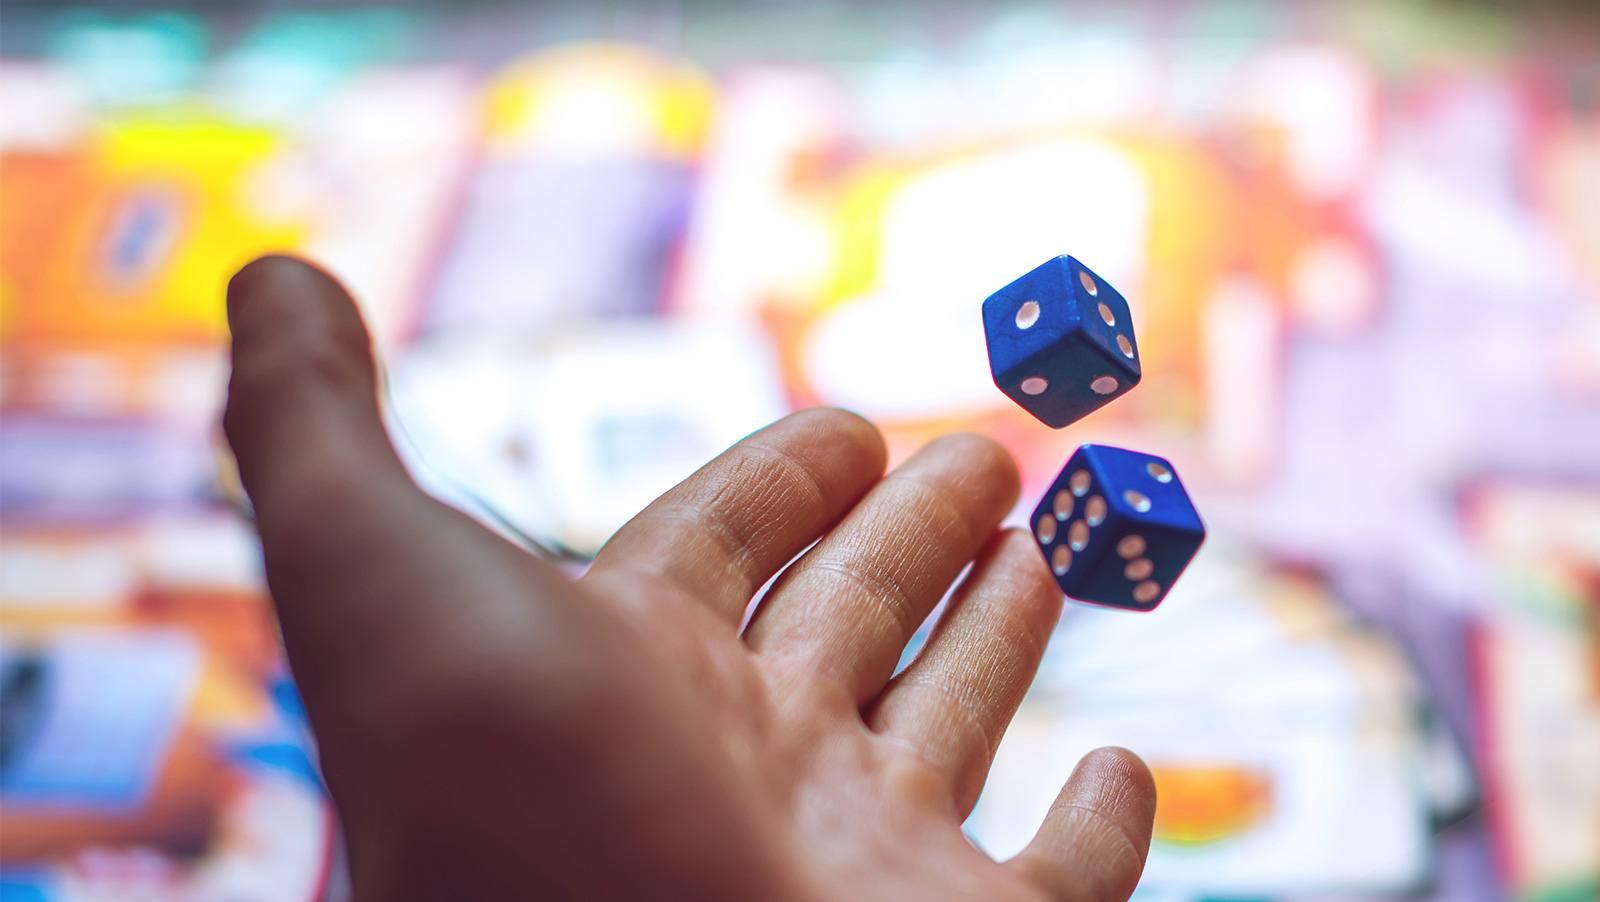 Kevin Klayton: Make your property the preferred play destination